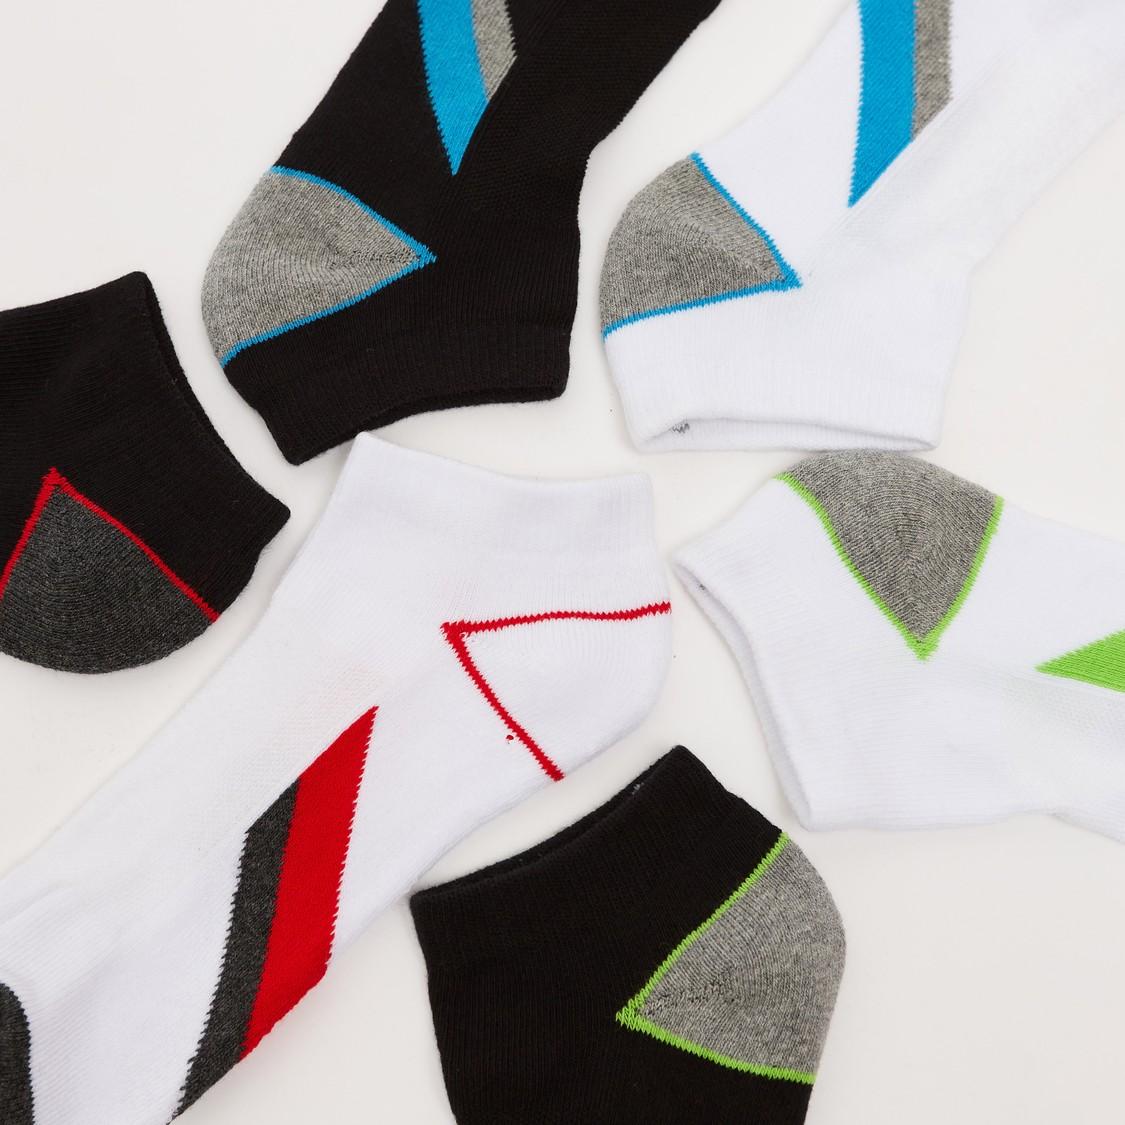 Pack of 6 - Printed Ankle Length Socks